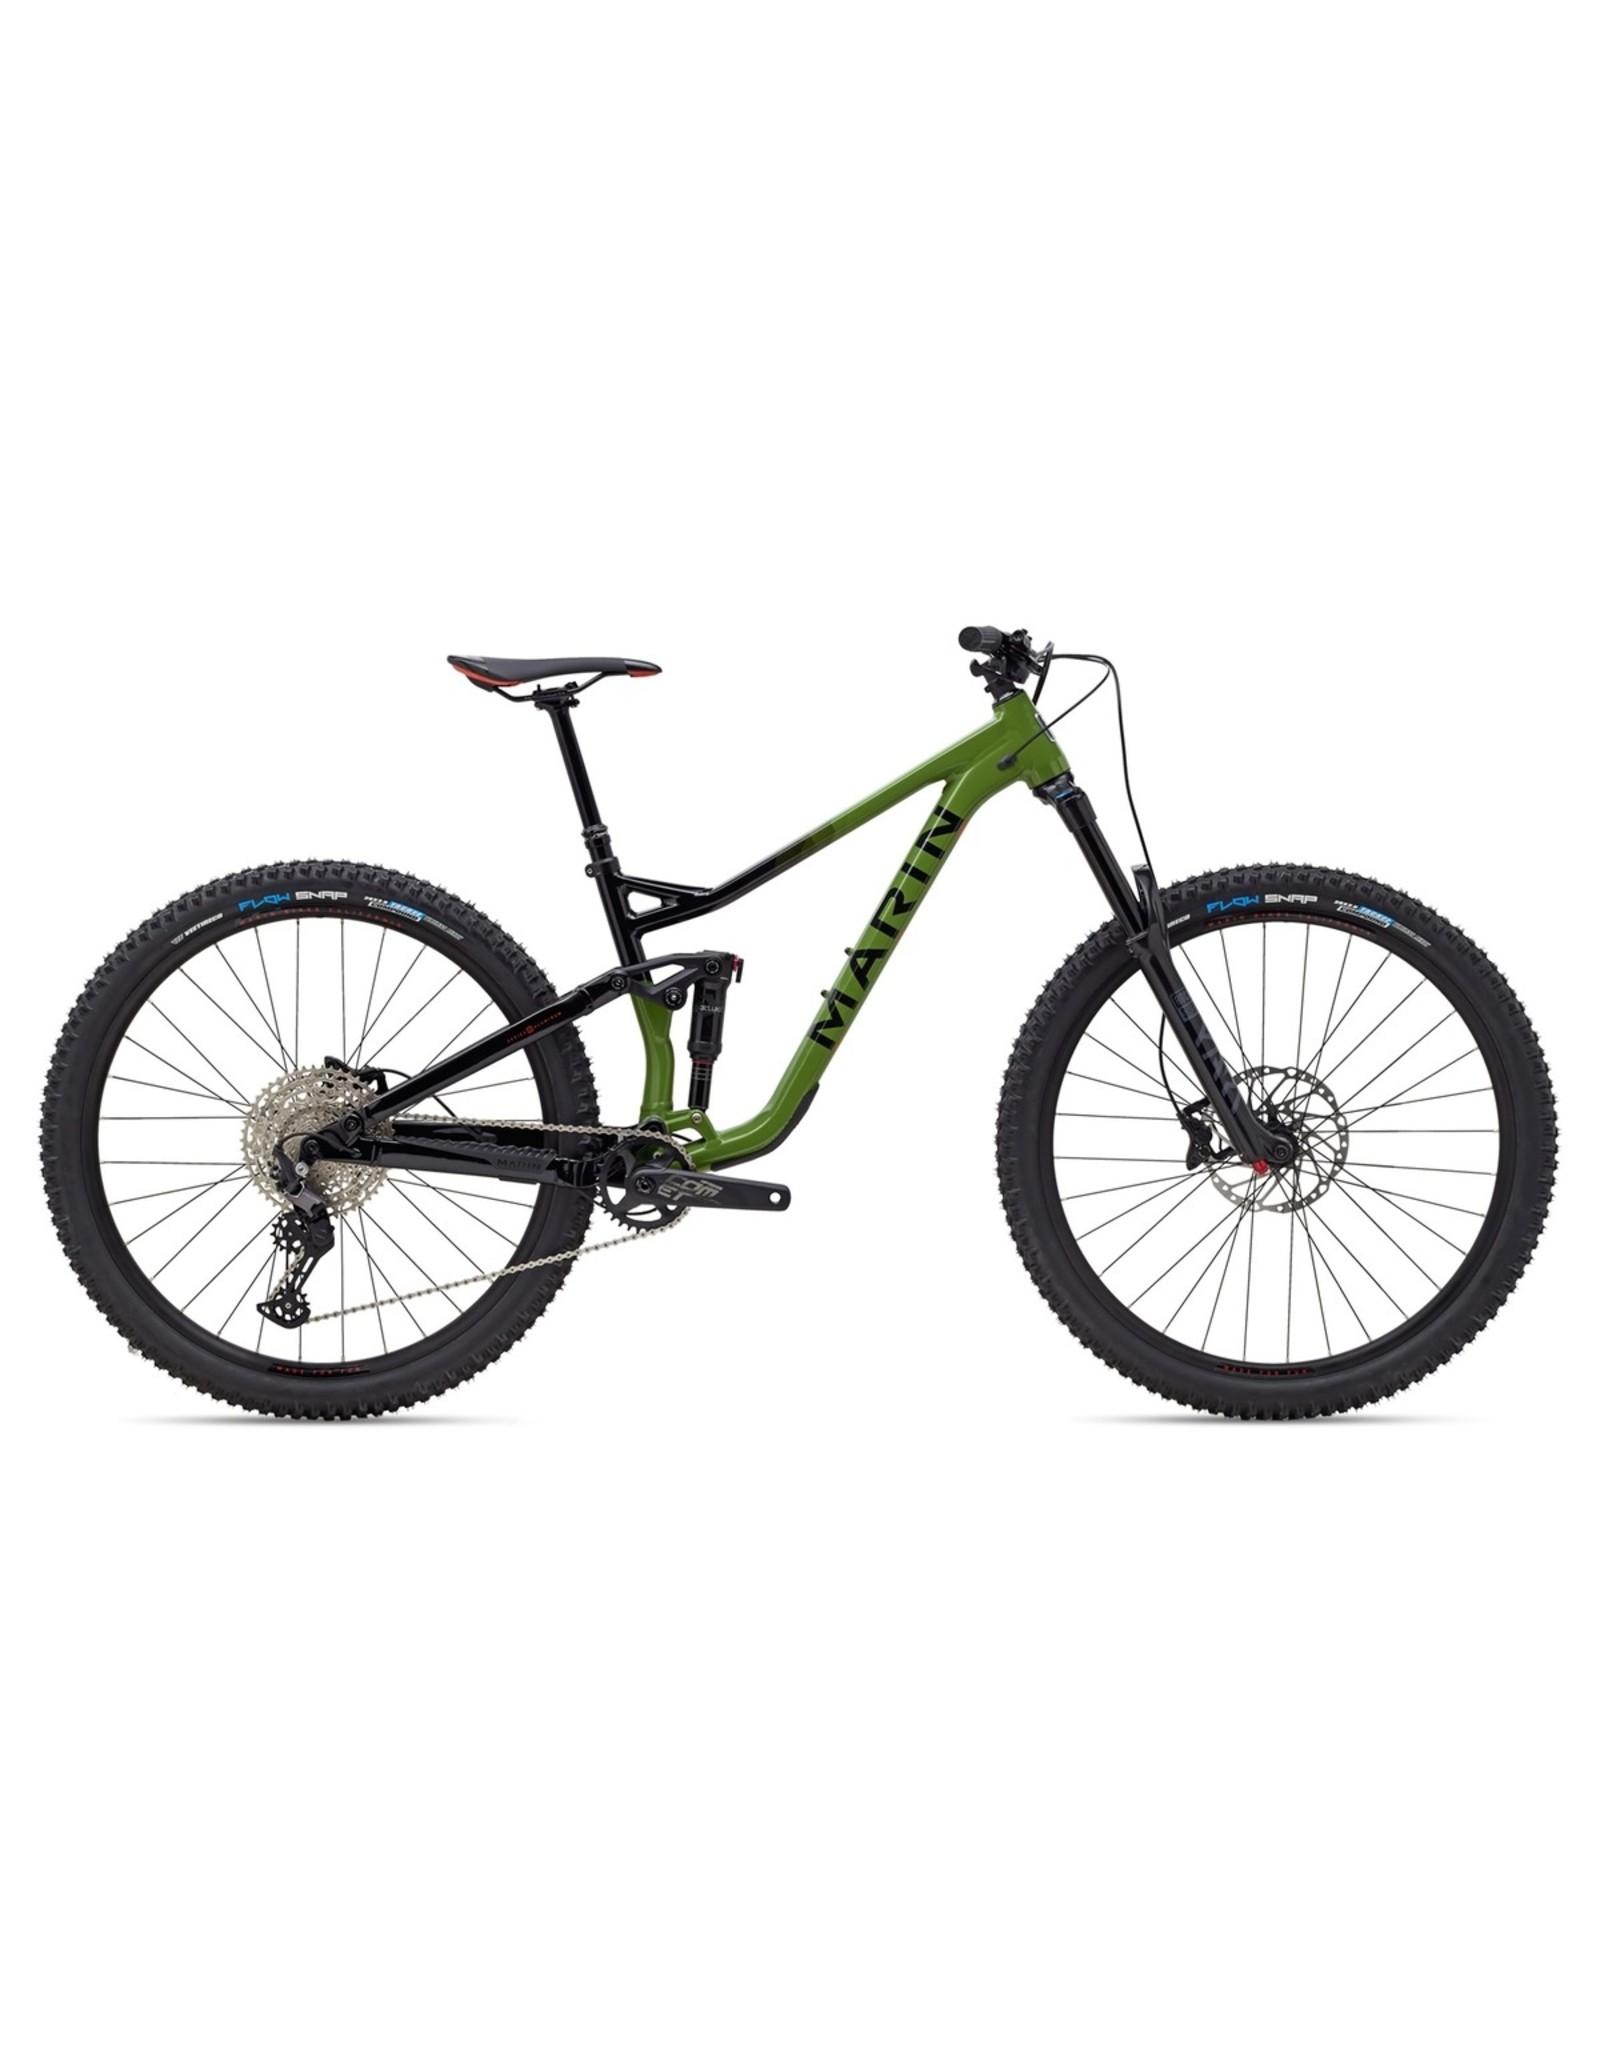 MARIN 2021 Alpine Trail 7